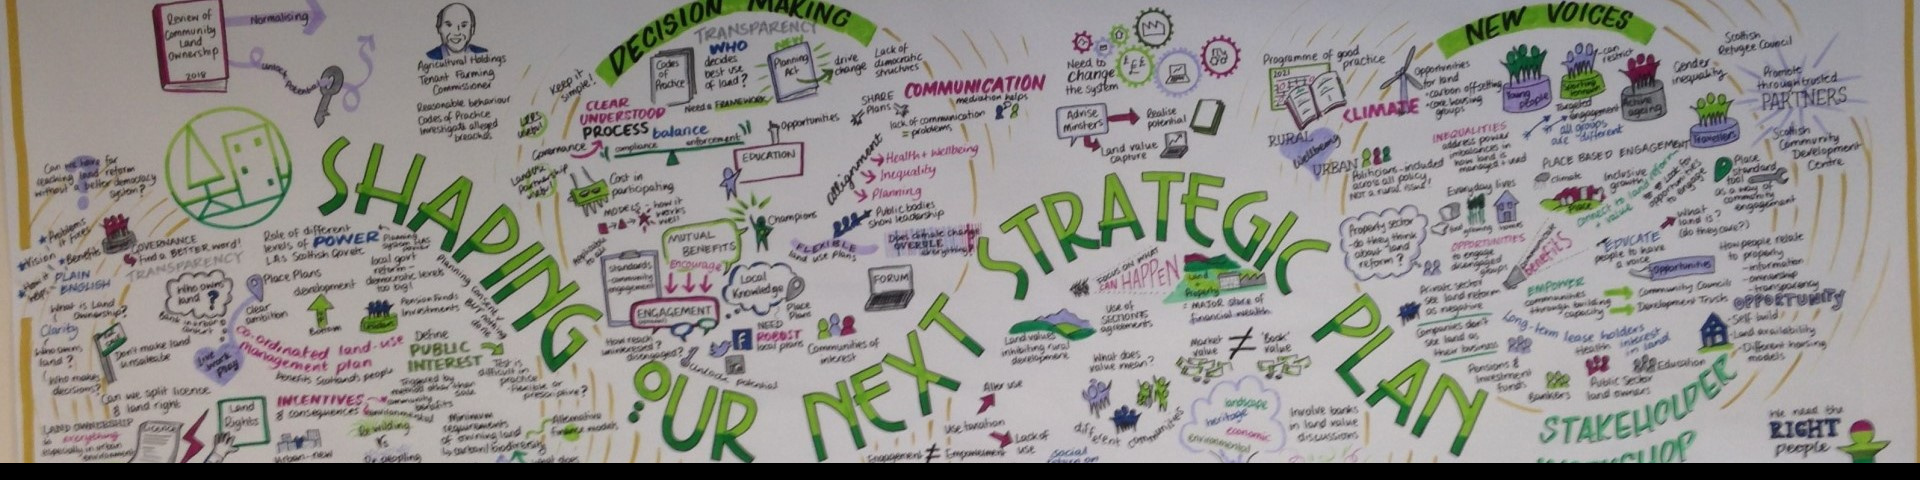 Infographic capturing stakeholder workshop feedback